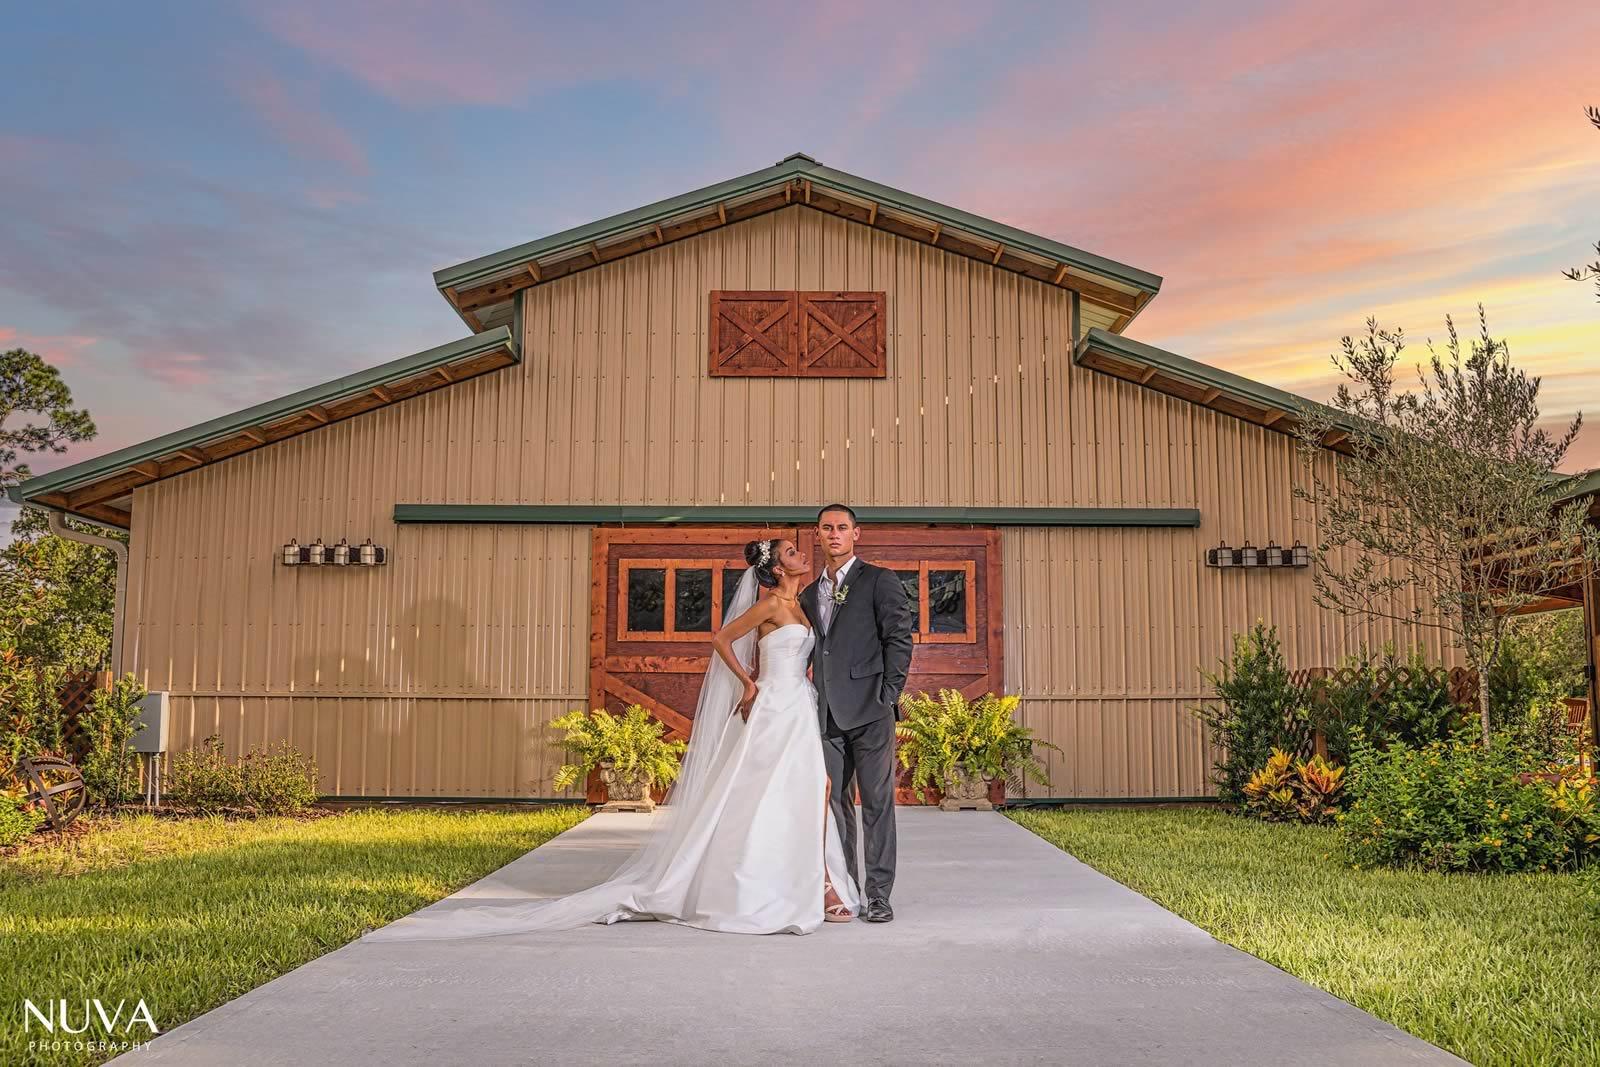 BLB Hacienda Barn weddings - weddings and events